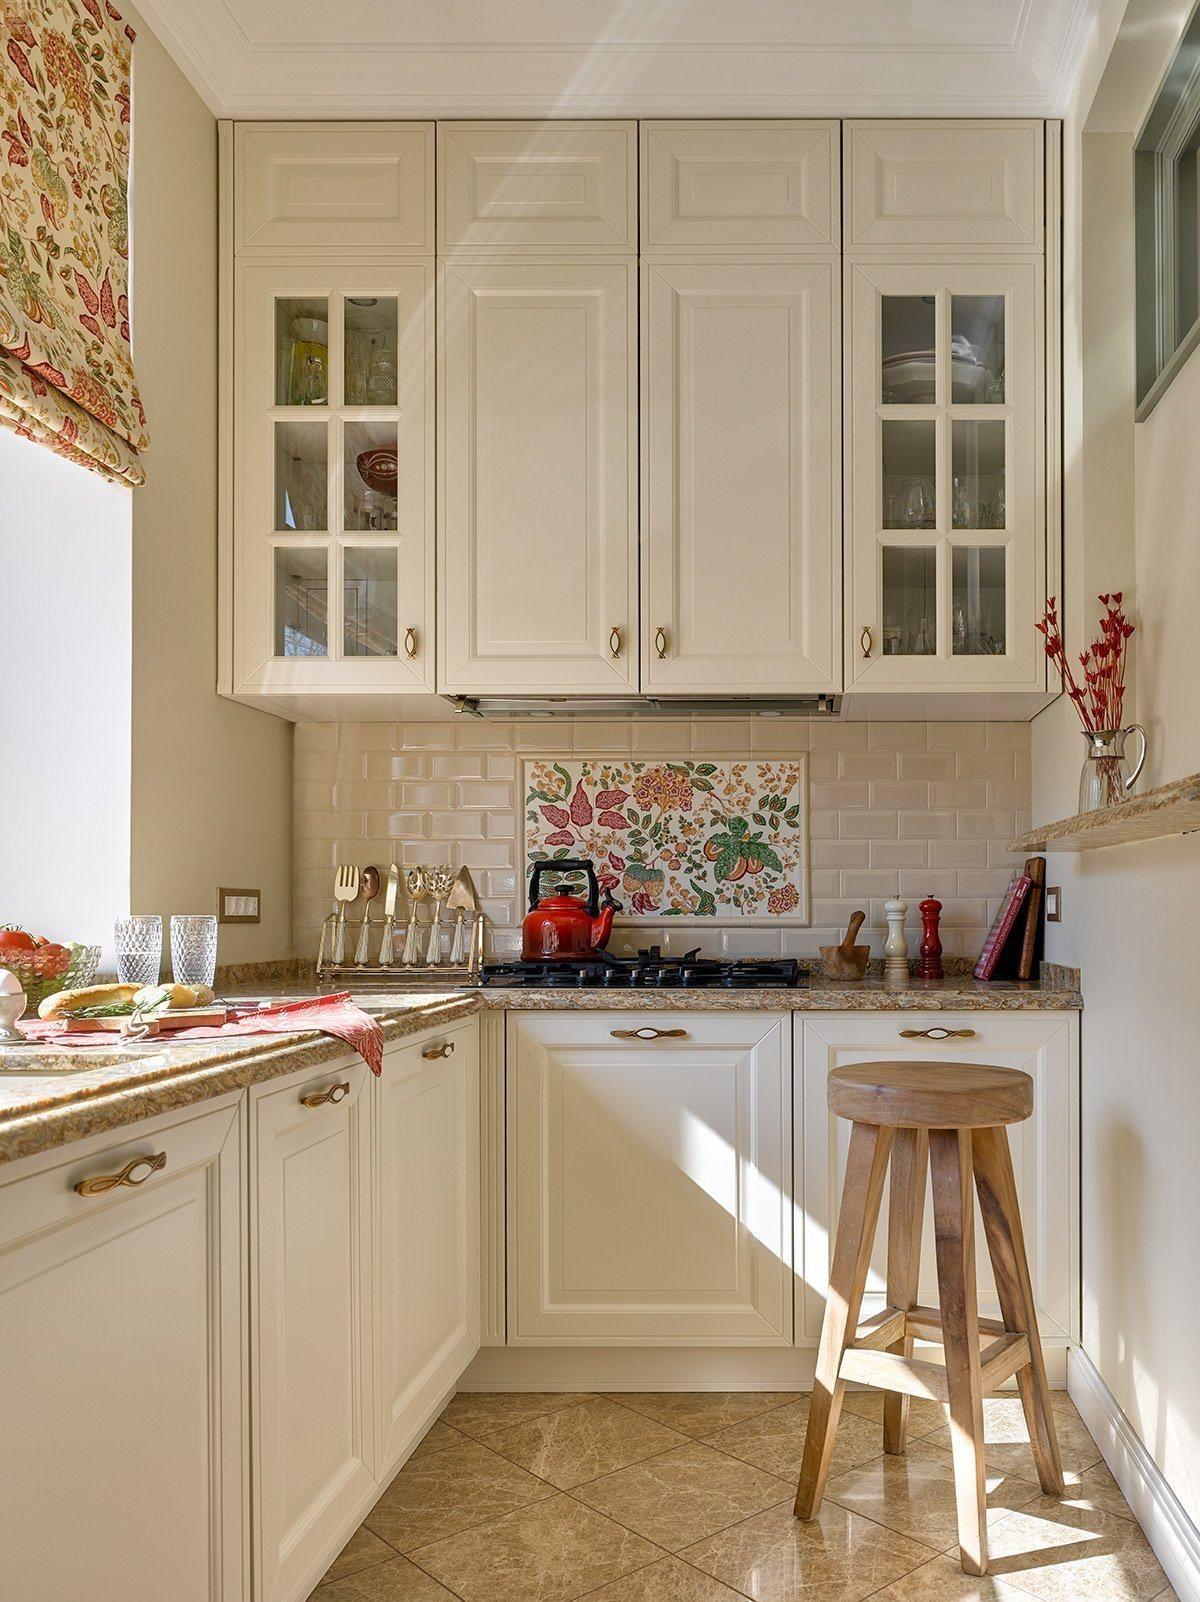 Online Kitchen Design White Cabinets Kitchen Design Home Depot Kitchen Design Kitchen Design Free Software Kitche In 2020 Kitchen Decor Kitchen Home Decor Kitchen